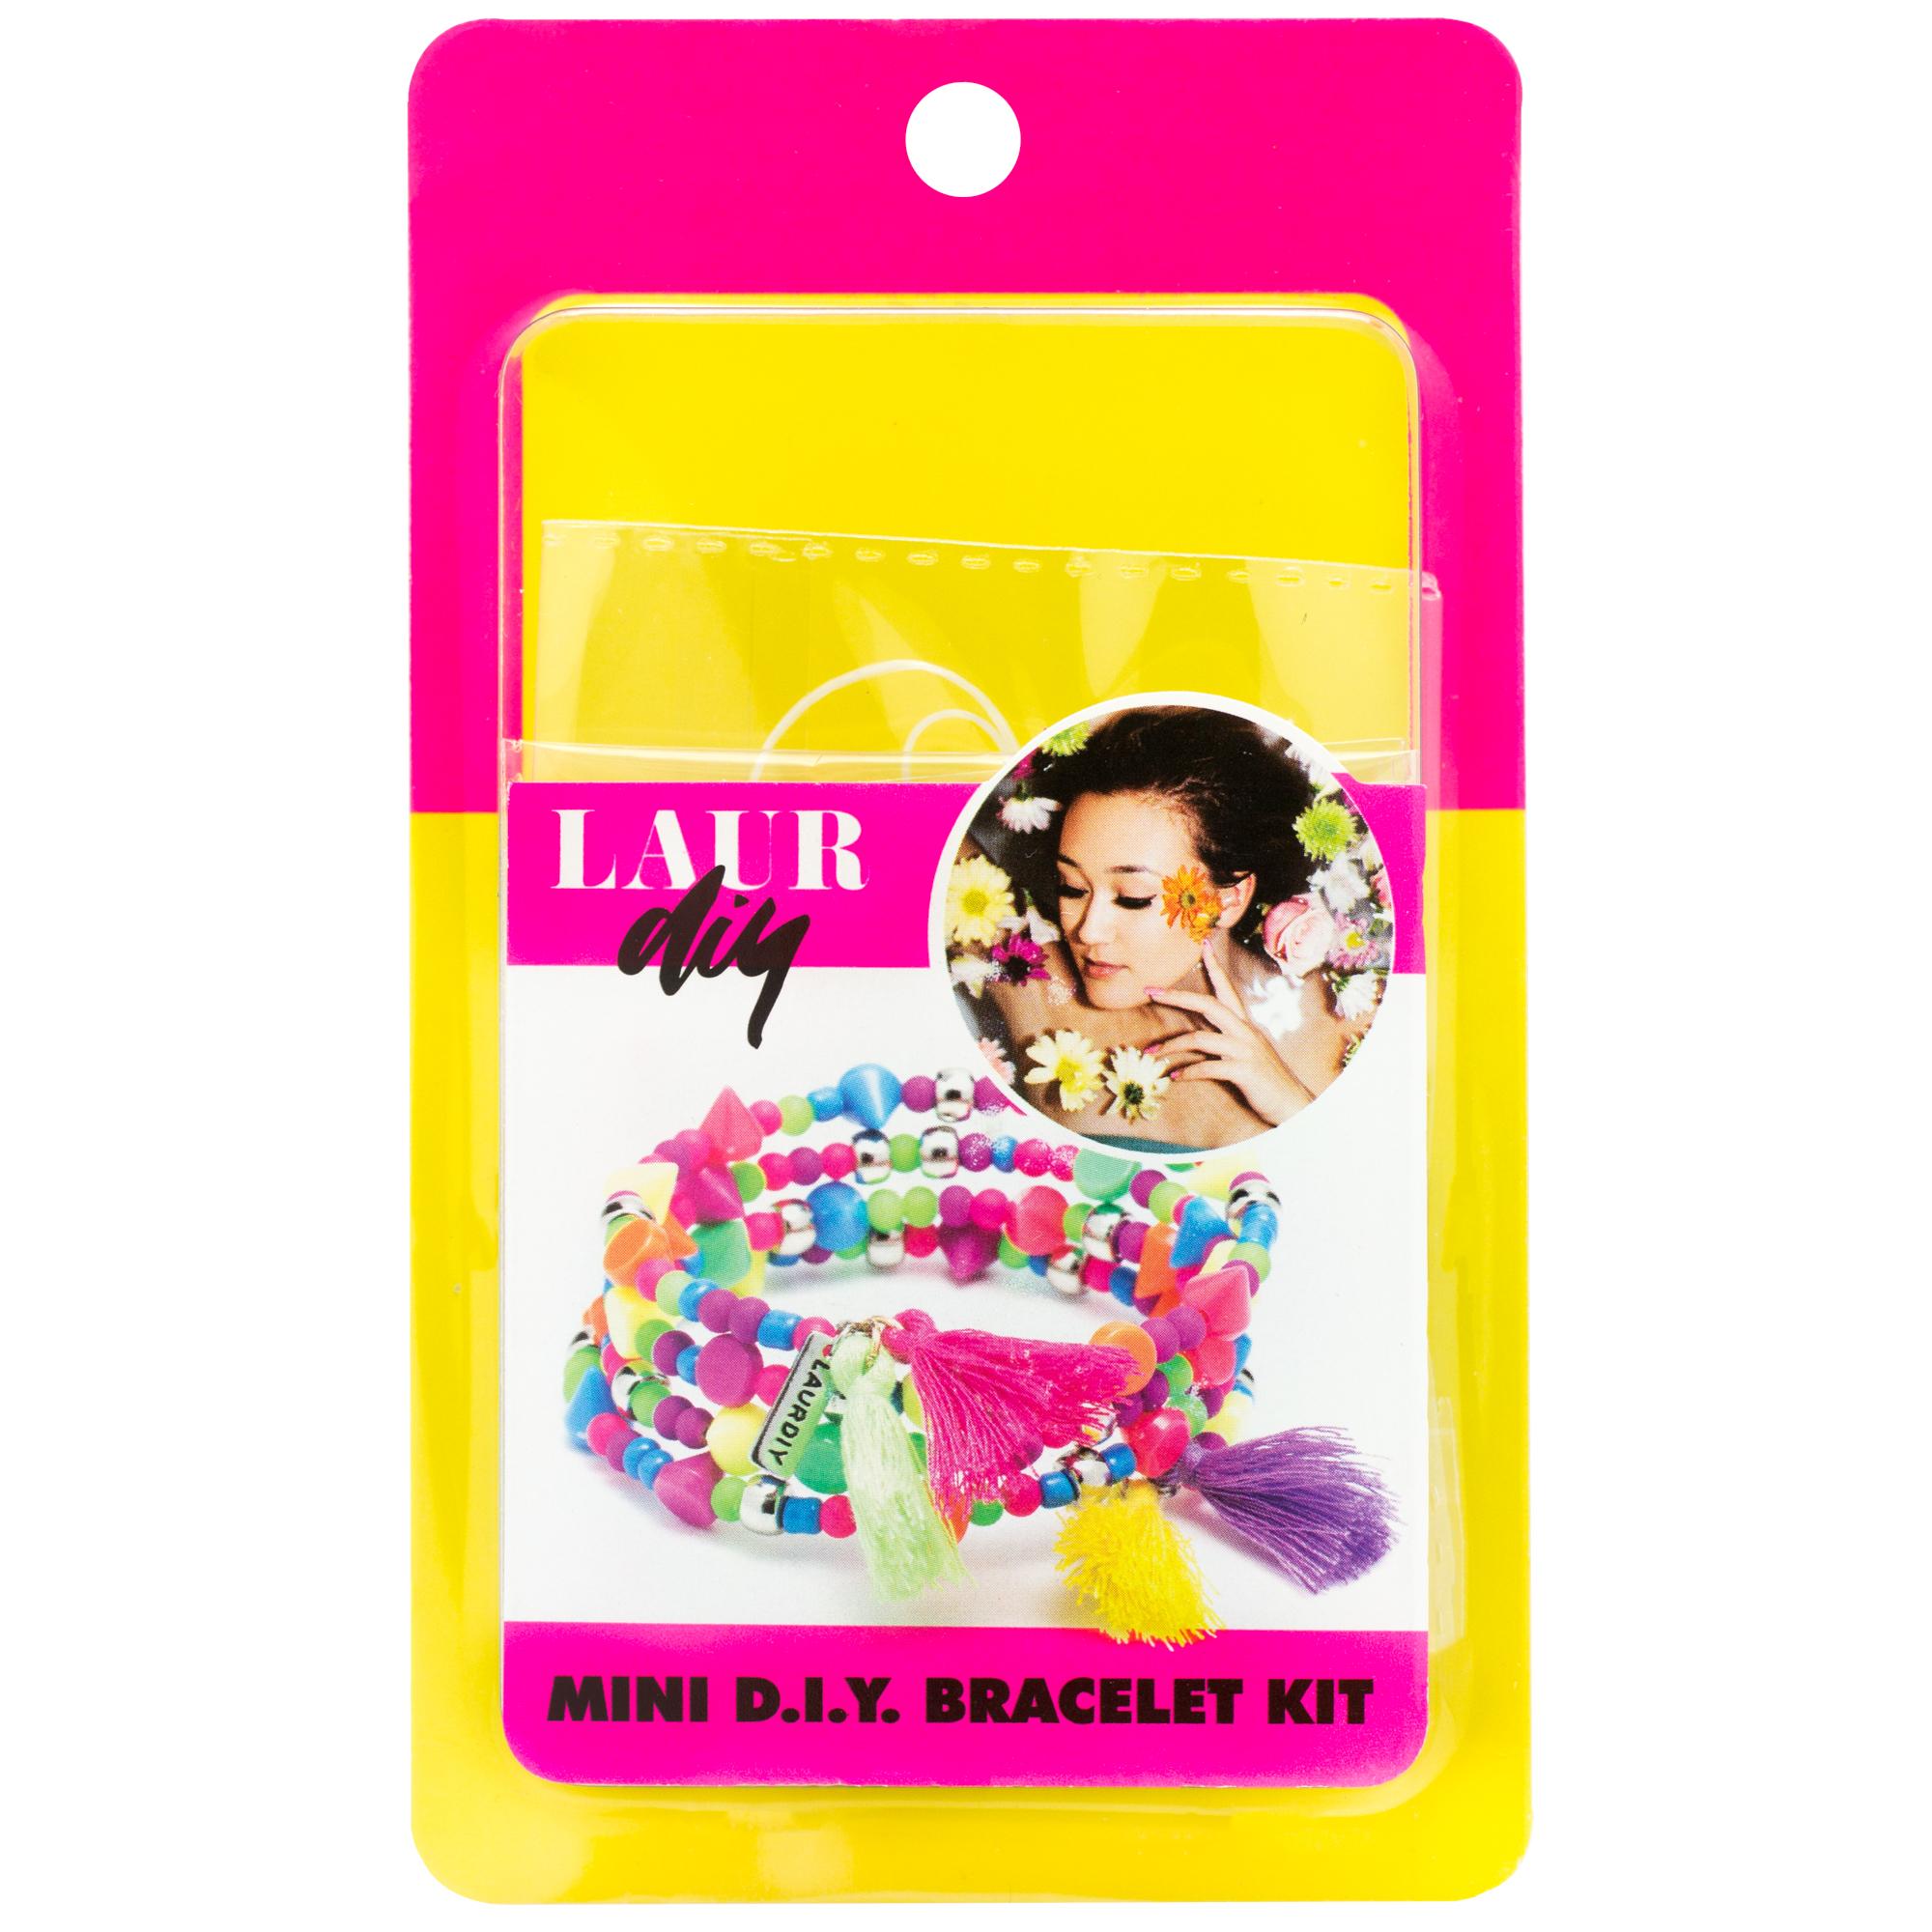 LaurDIY Neon Tassel Bracelet Mini DIY Kit